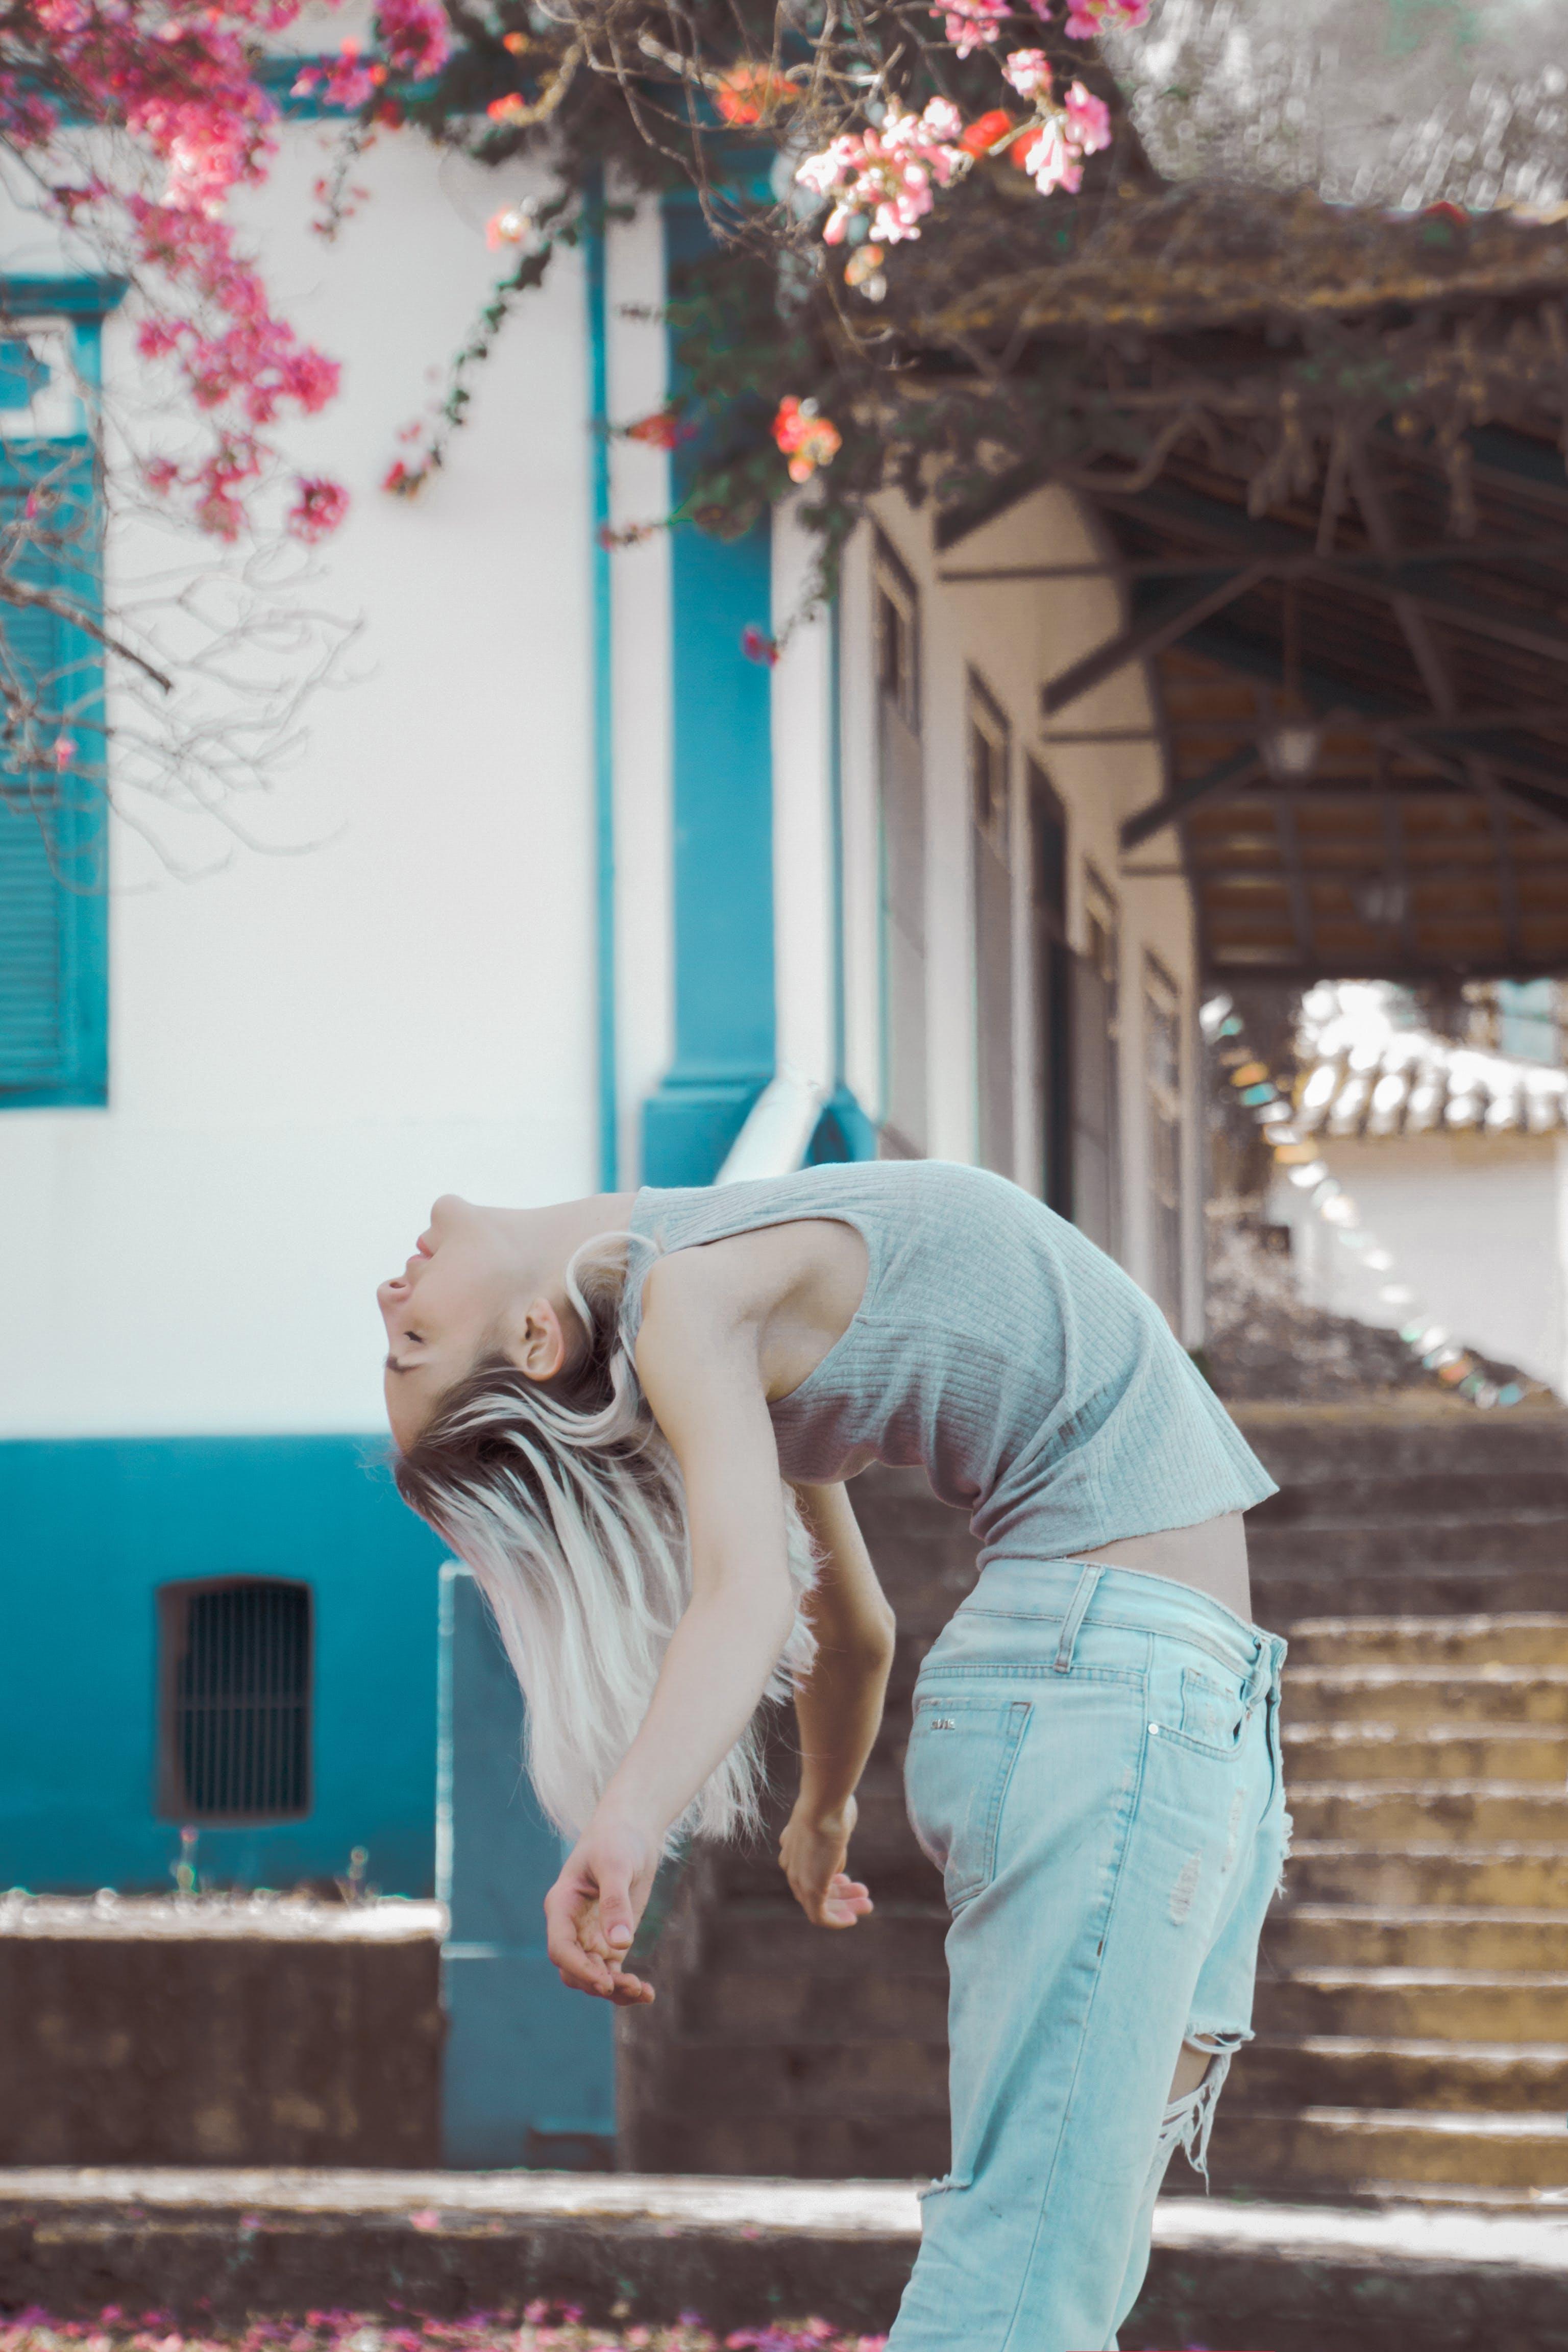 Woman Bending Beside House